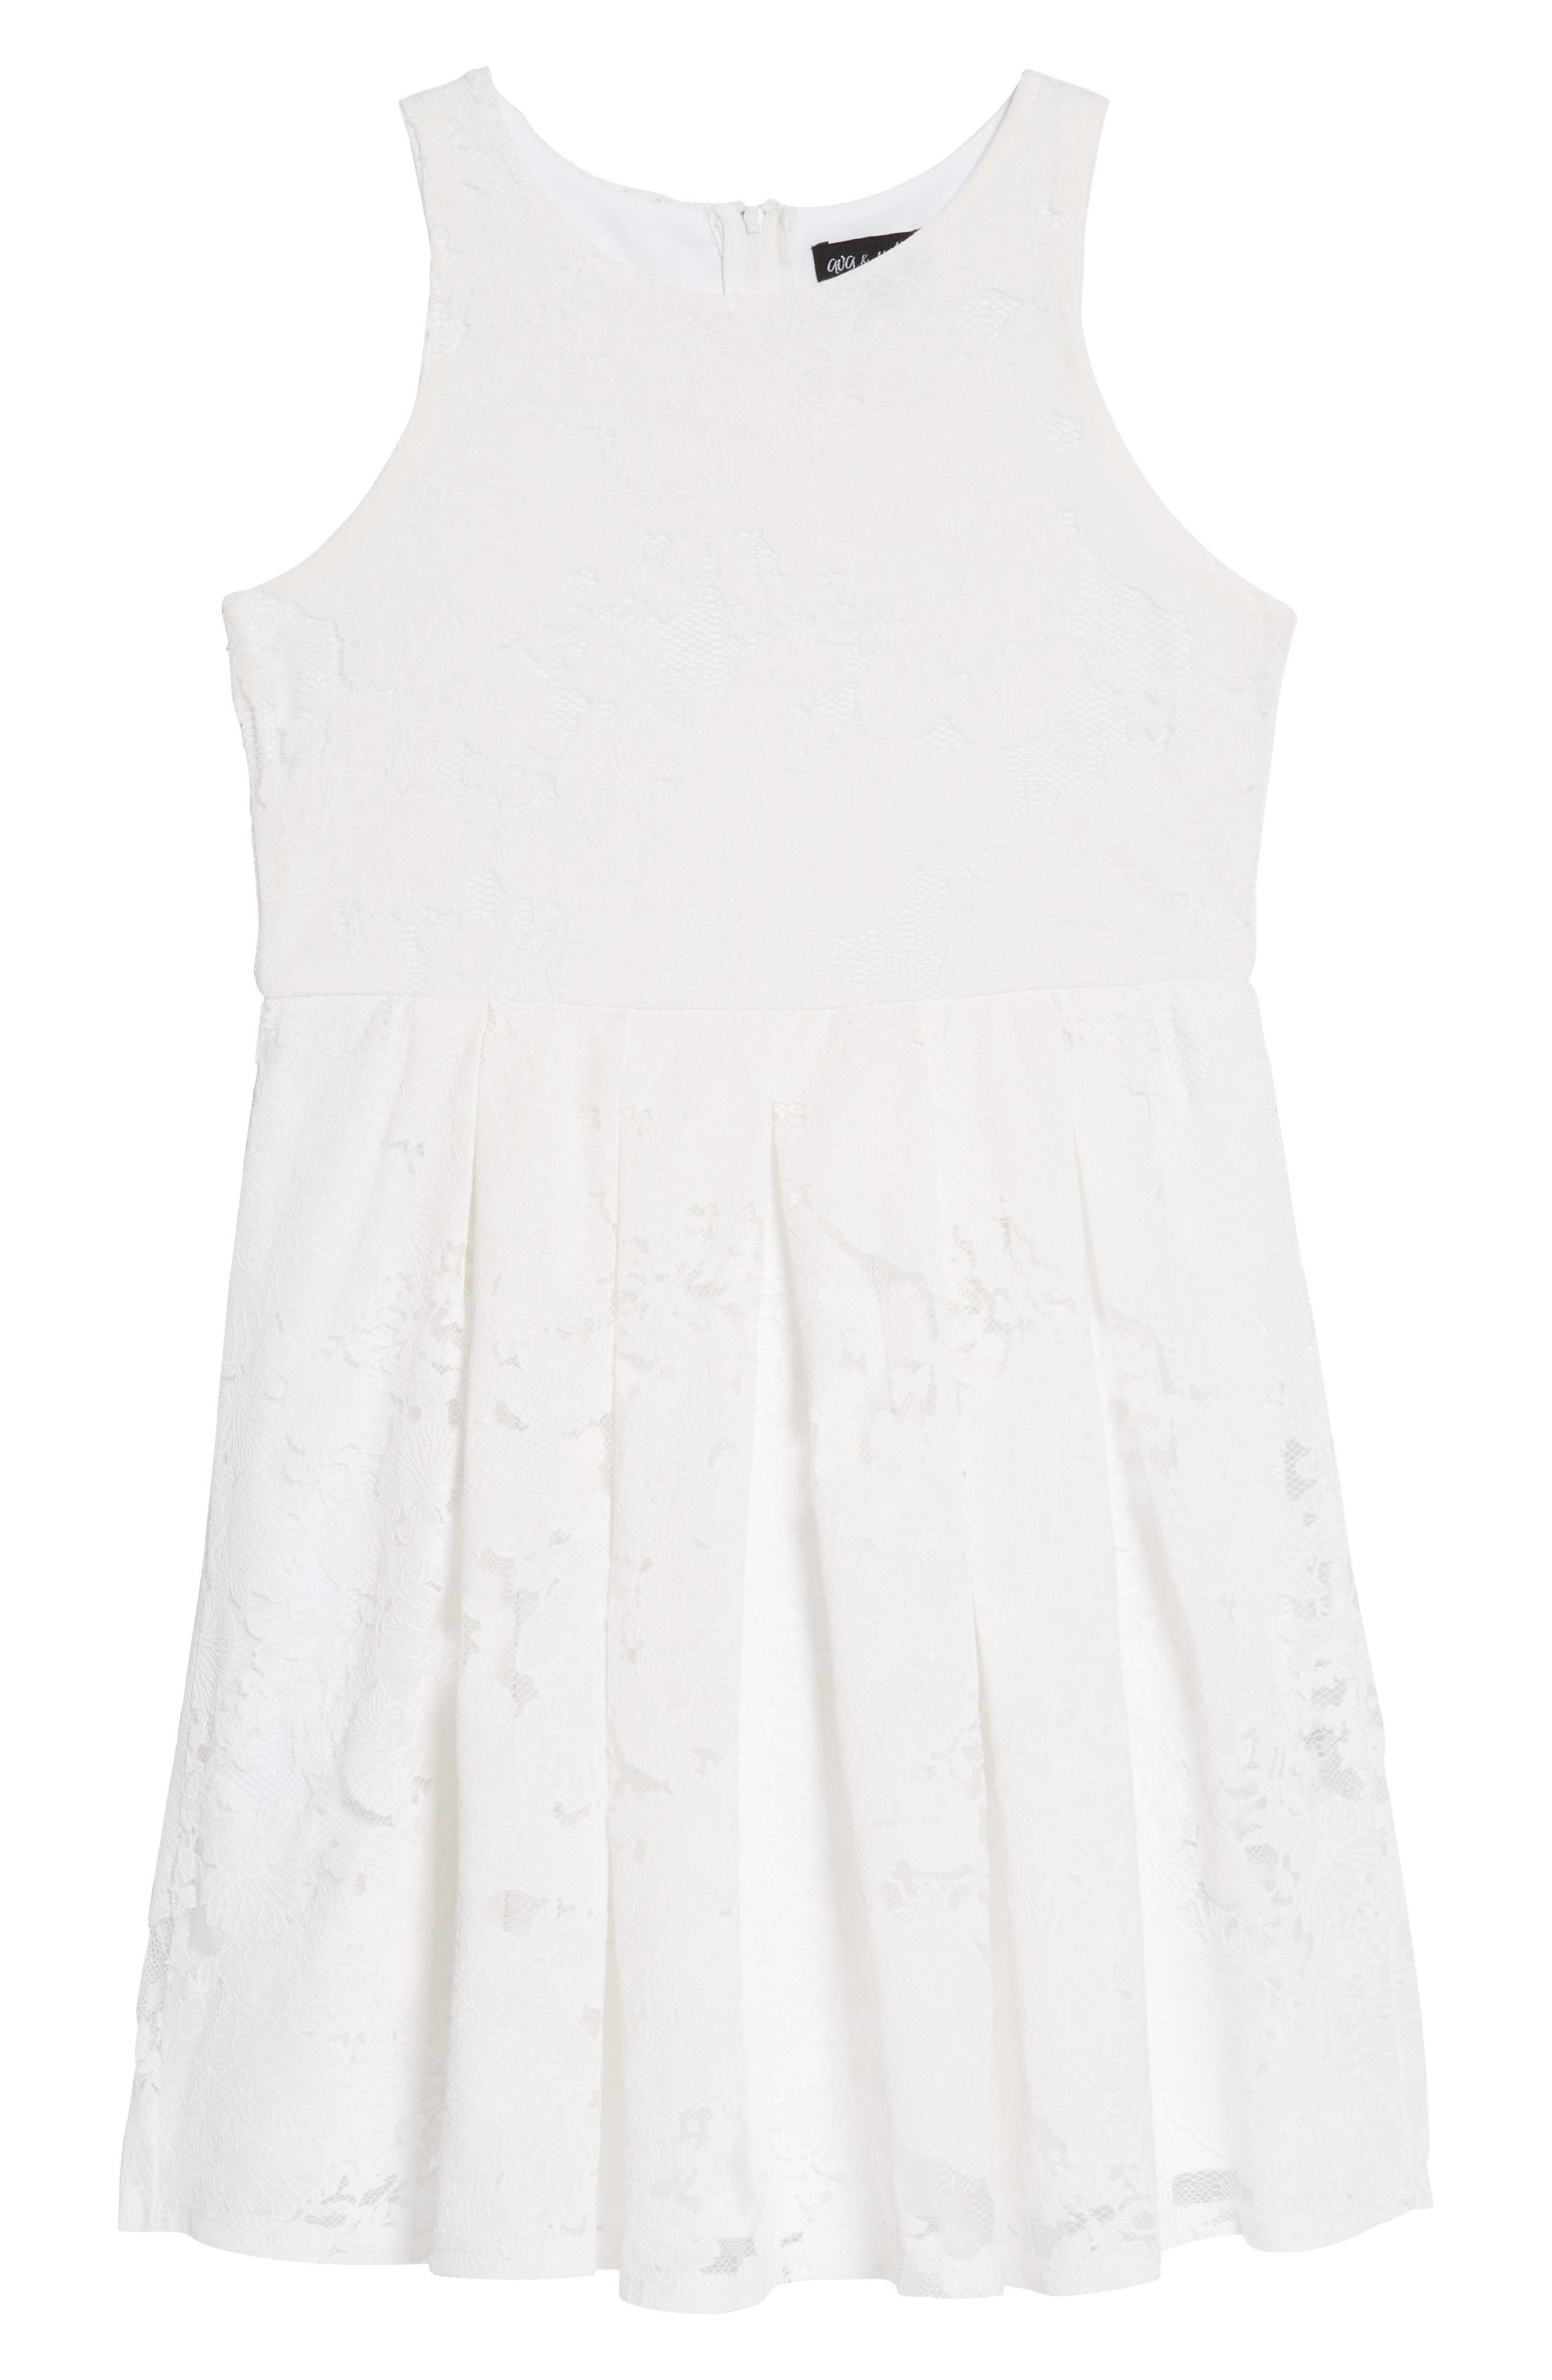 Lace Overlay Skater Dress,                             Main thumbnail 1, color,                             White